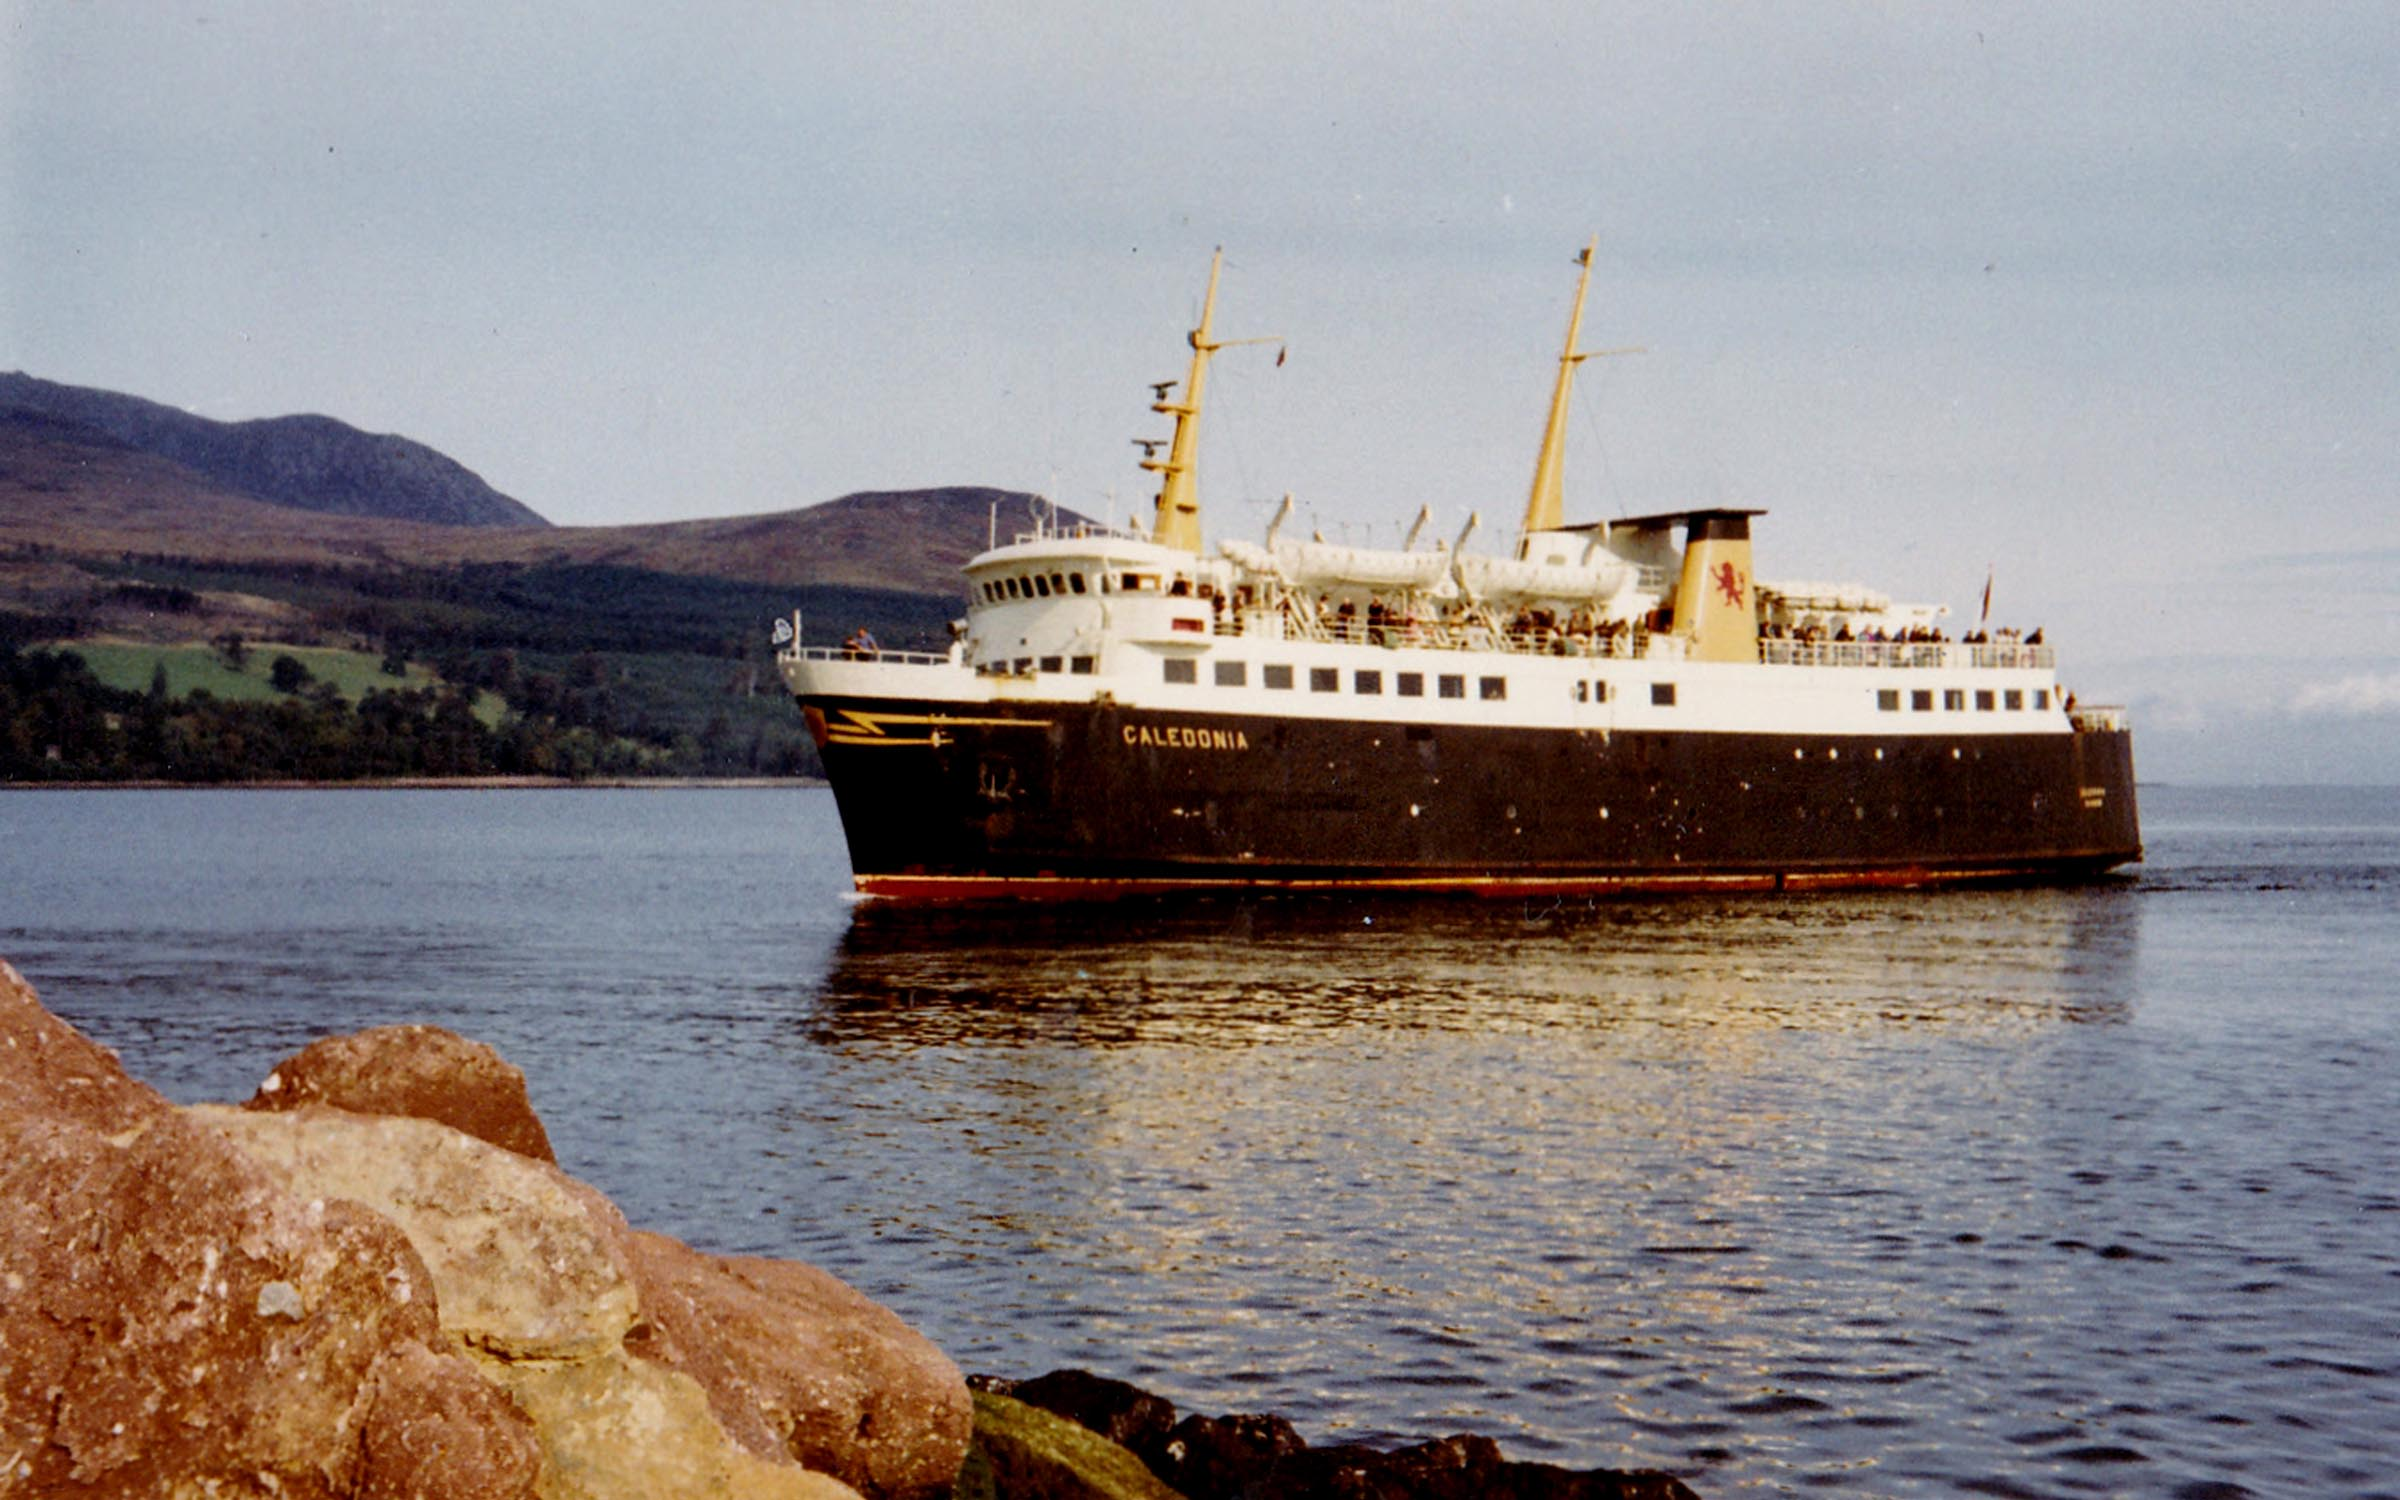 Caledonia arriving at Brodick (Jim Aikman Smith)